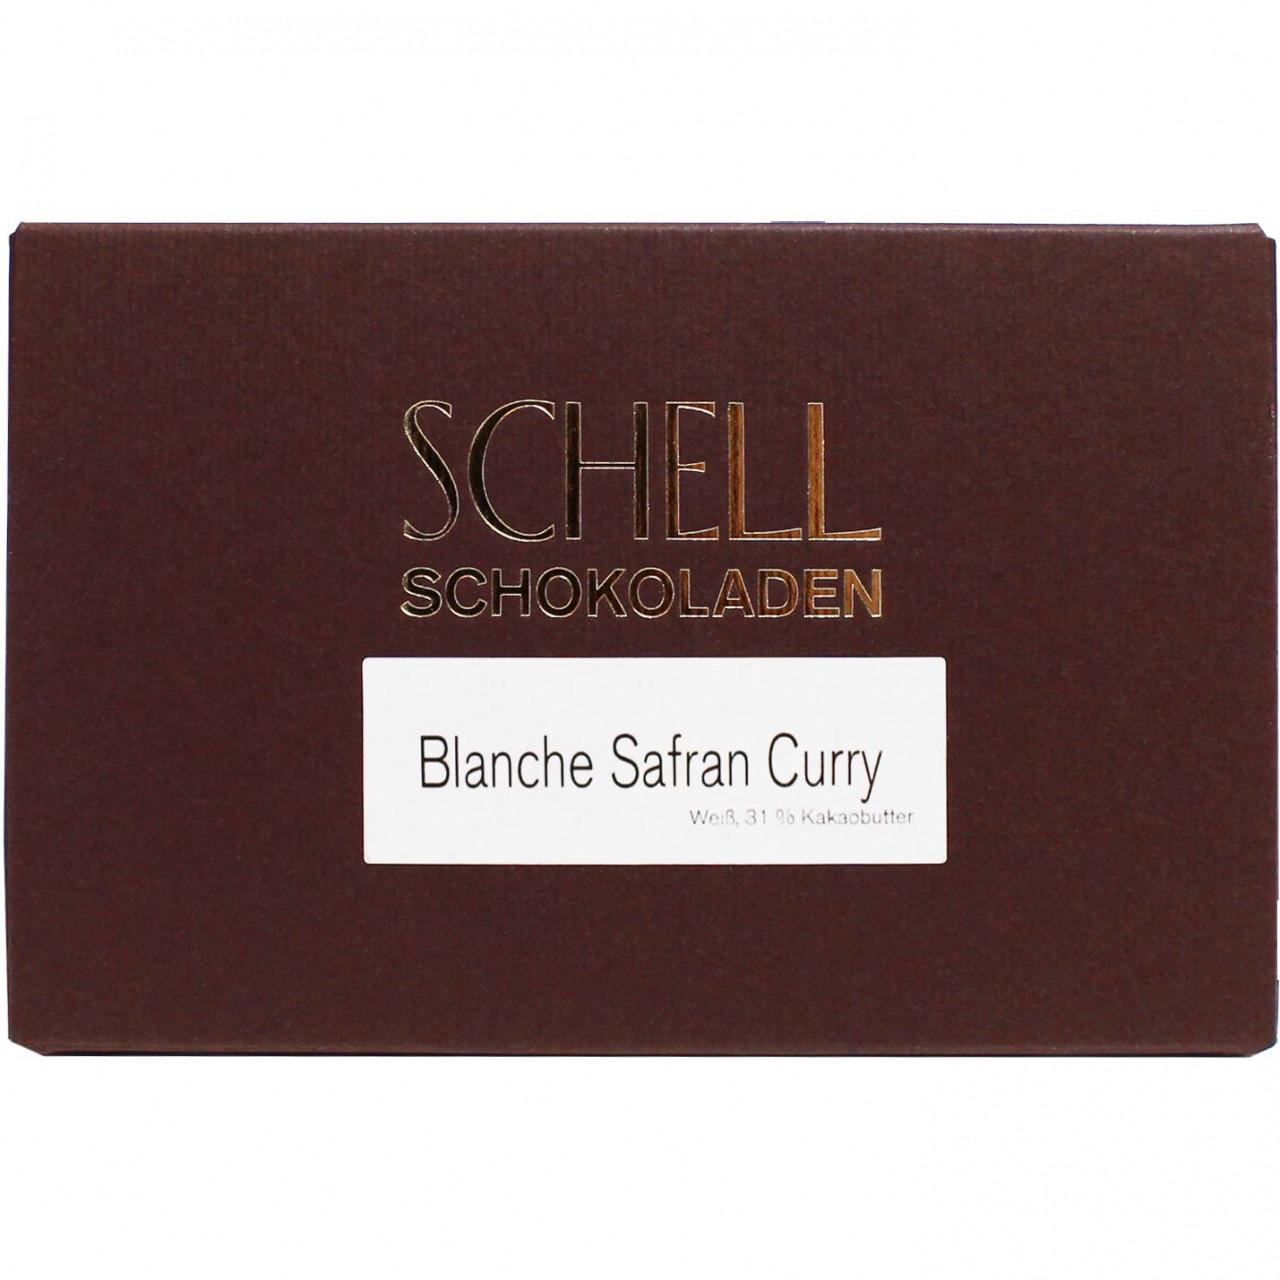 Blanche Saffron Curry 28% - chocolate blanco - Barras de chocolate, Alemania, chocolate alemán, Chocolate con especias - Chocolats-De-Luxe